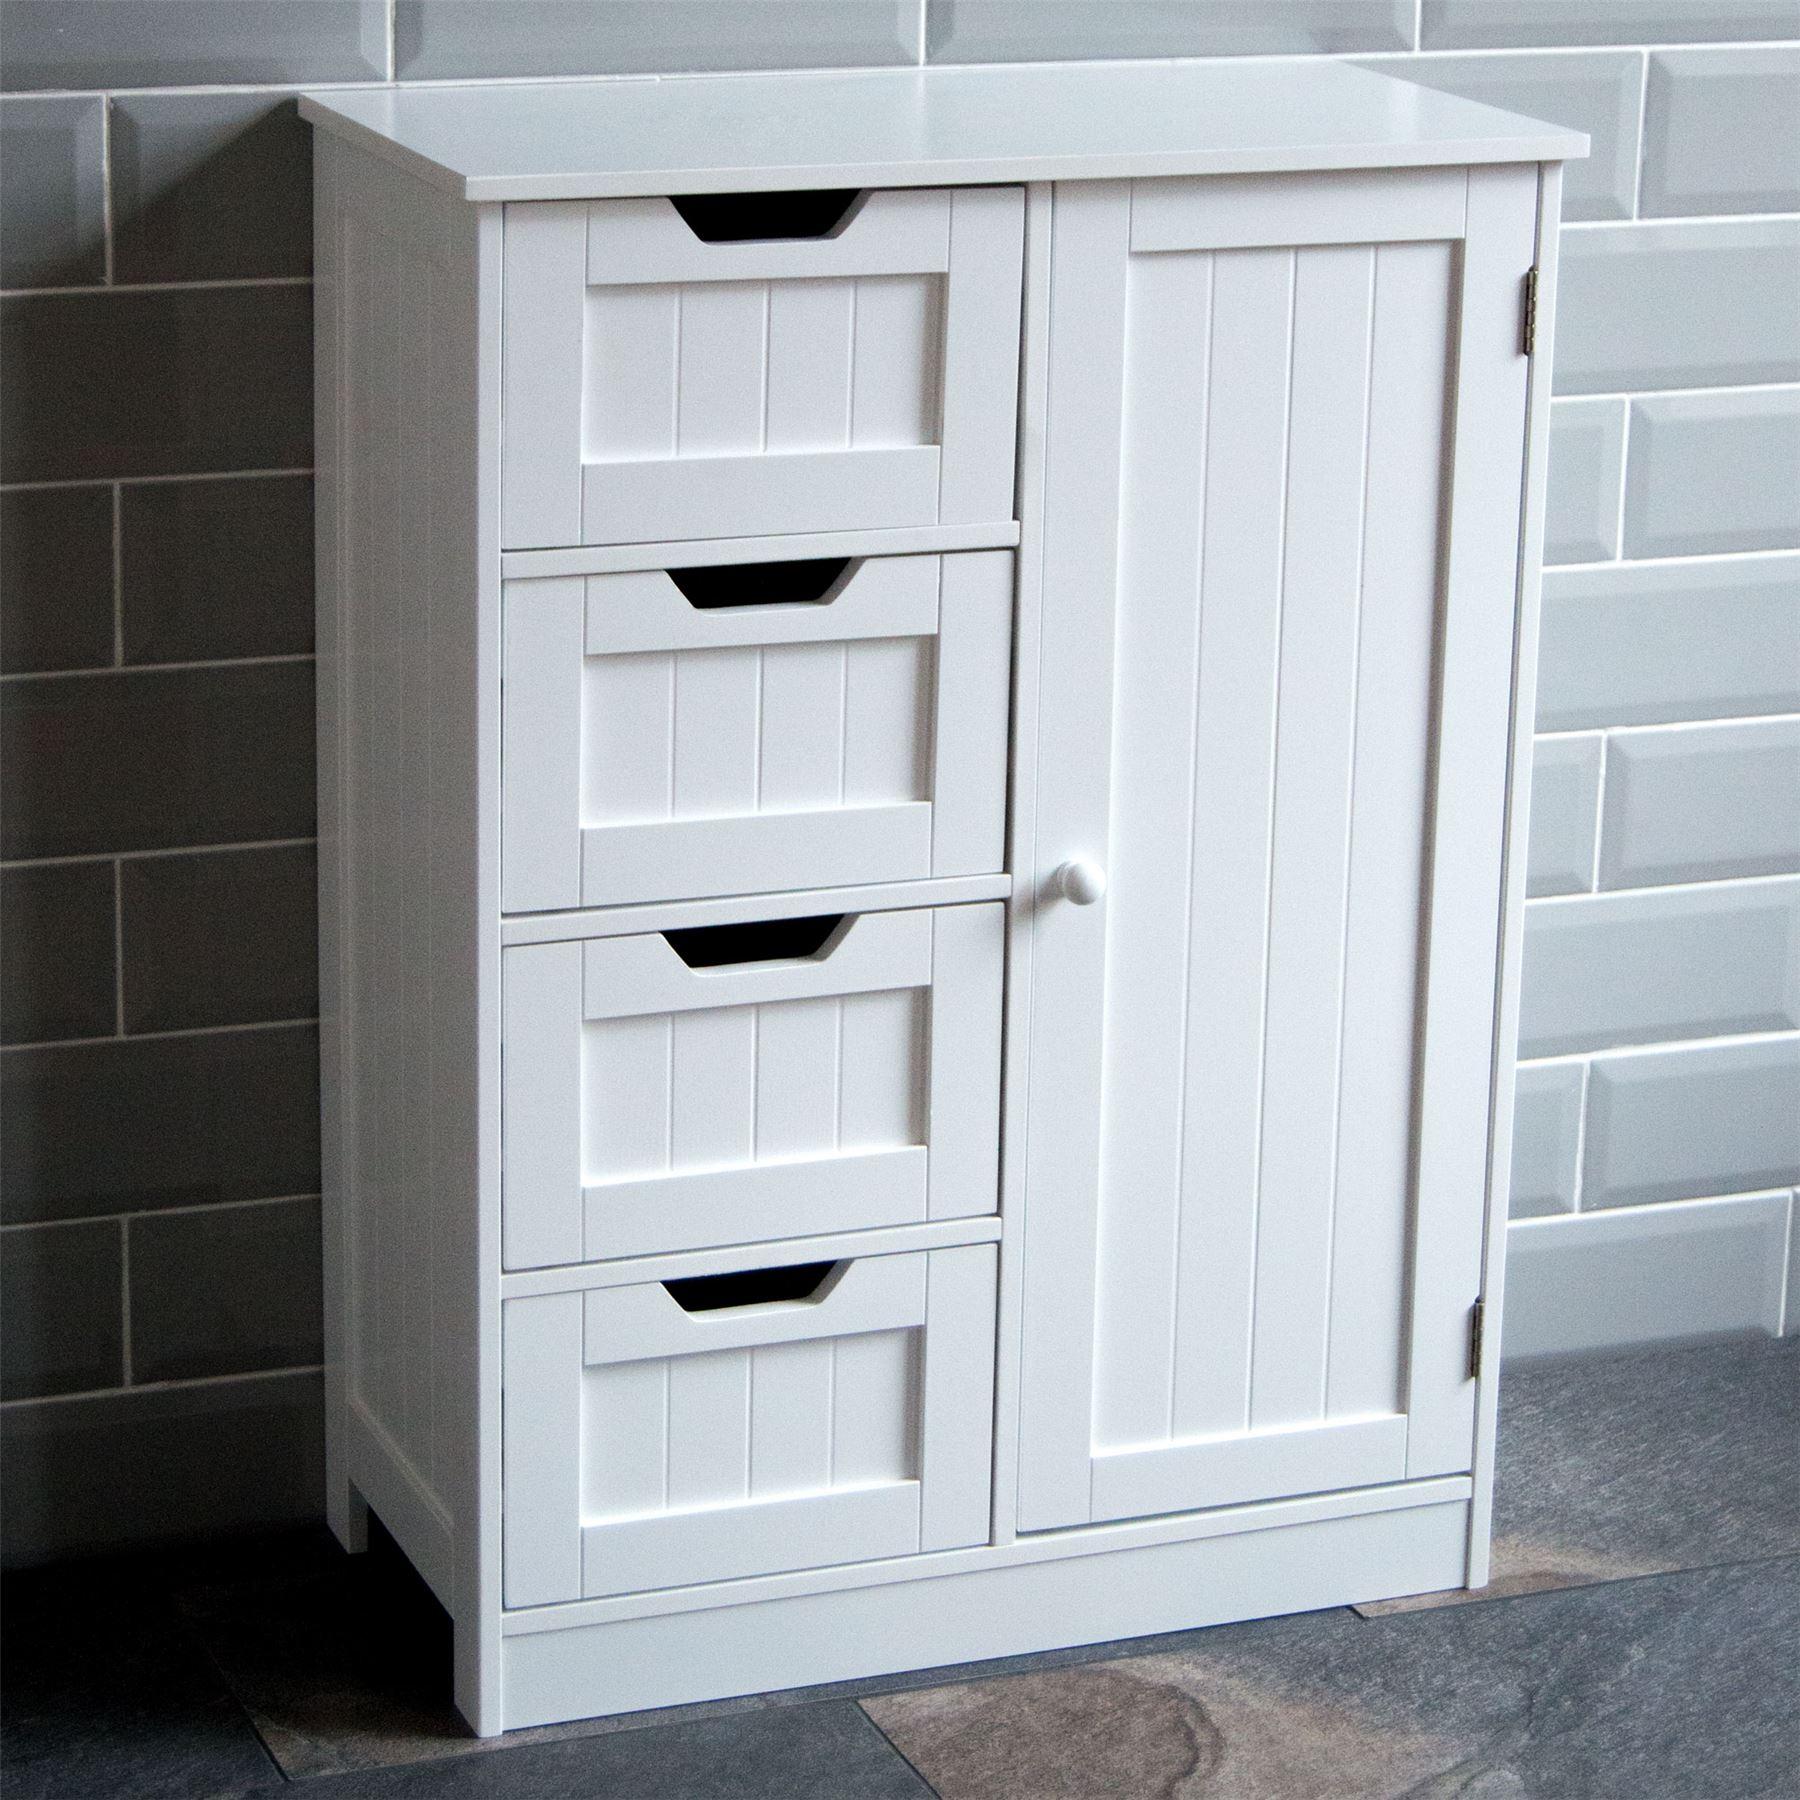 Details About Bathroom 4 Drawer Cabinet Door Storage Cupboard Wooden White Home Discount in measurements 1800 X 1800